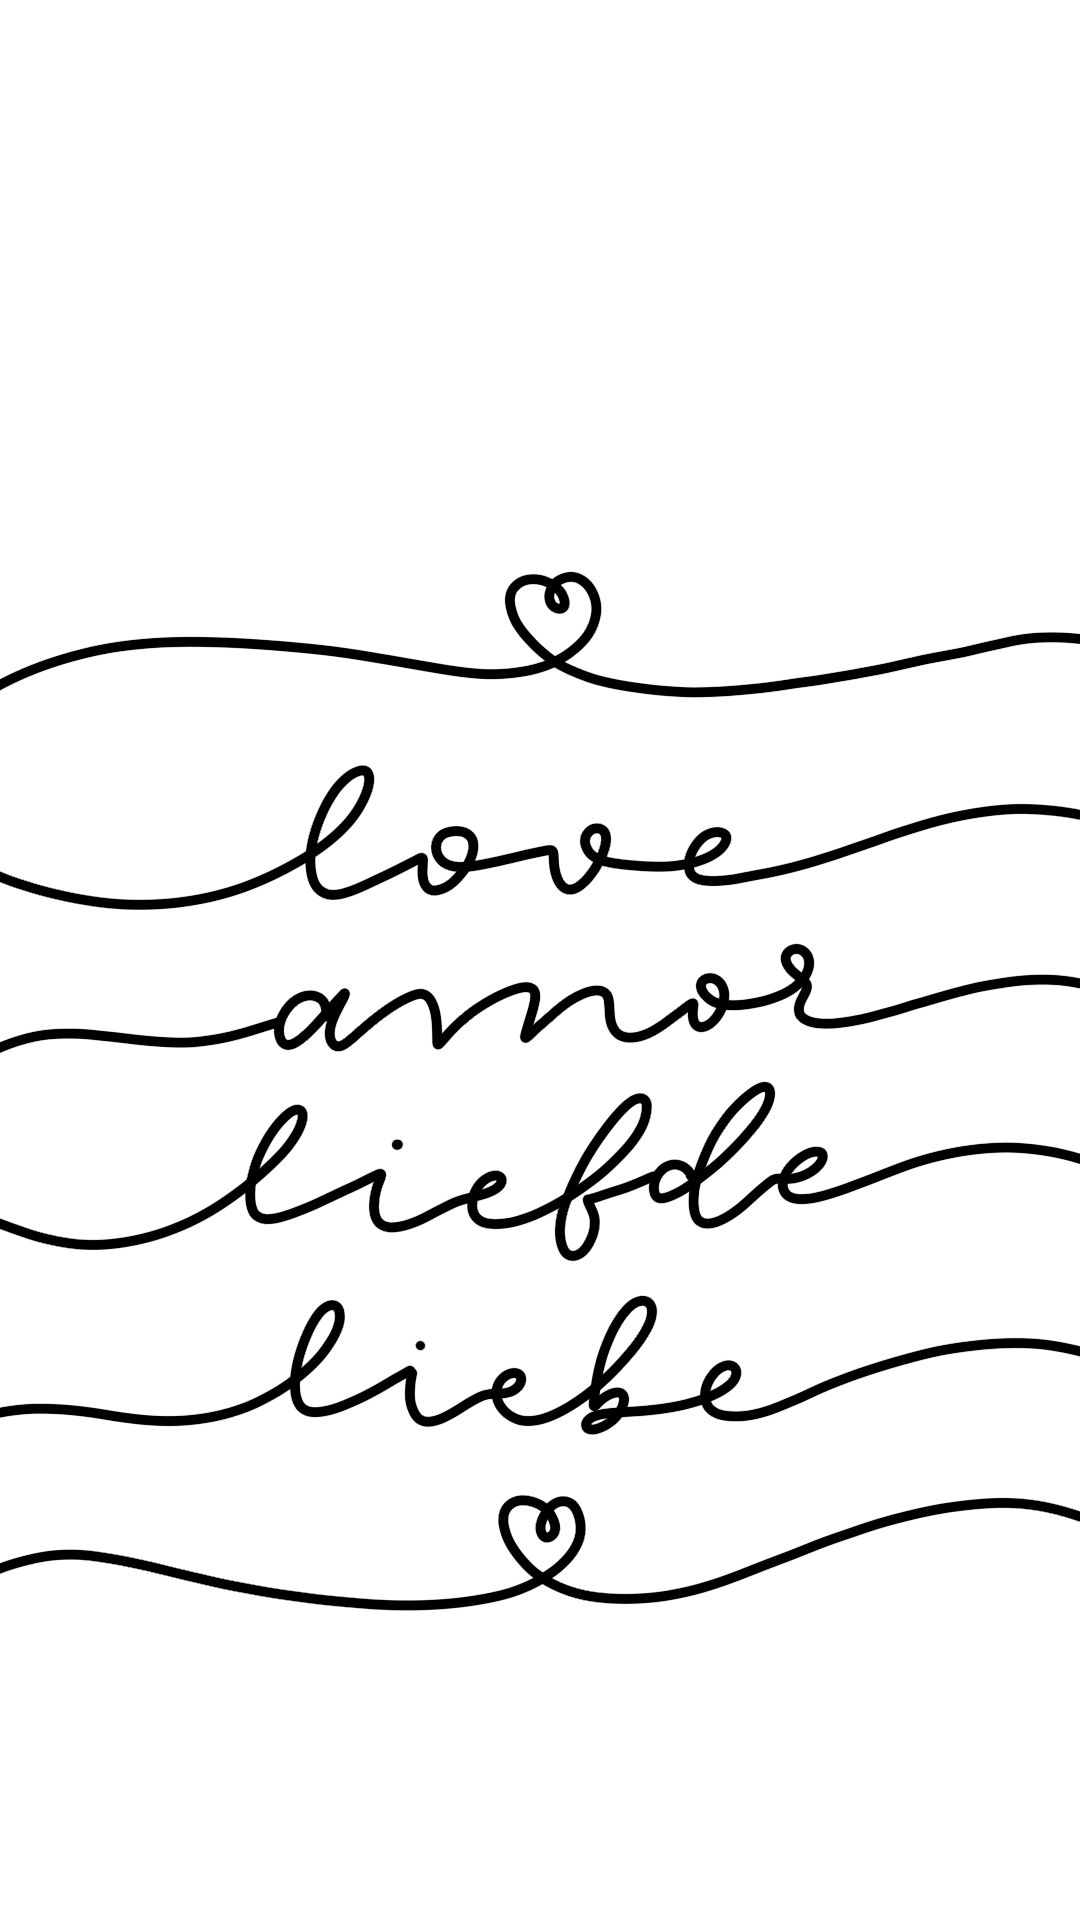 Gocase Lovegocase Wallpaper Pink Love Amor Liefde